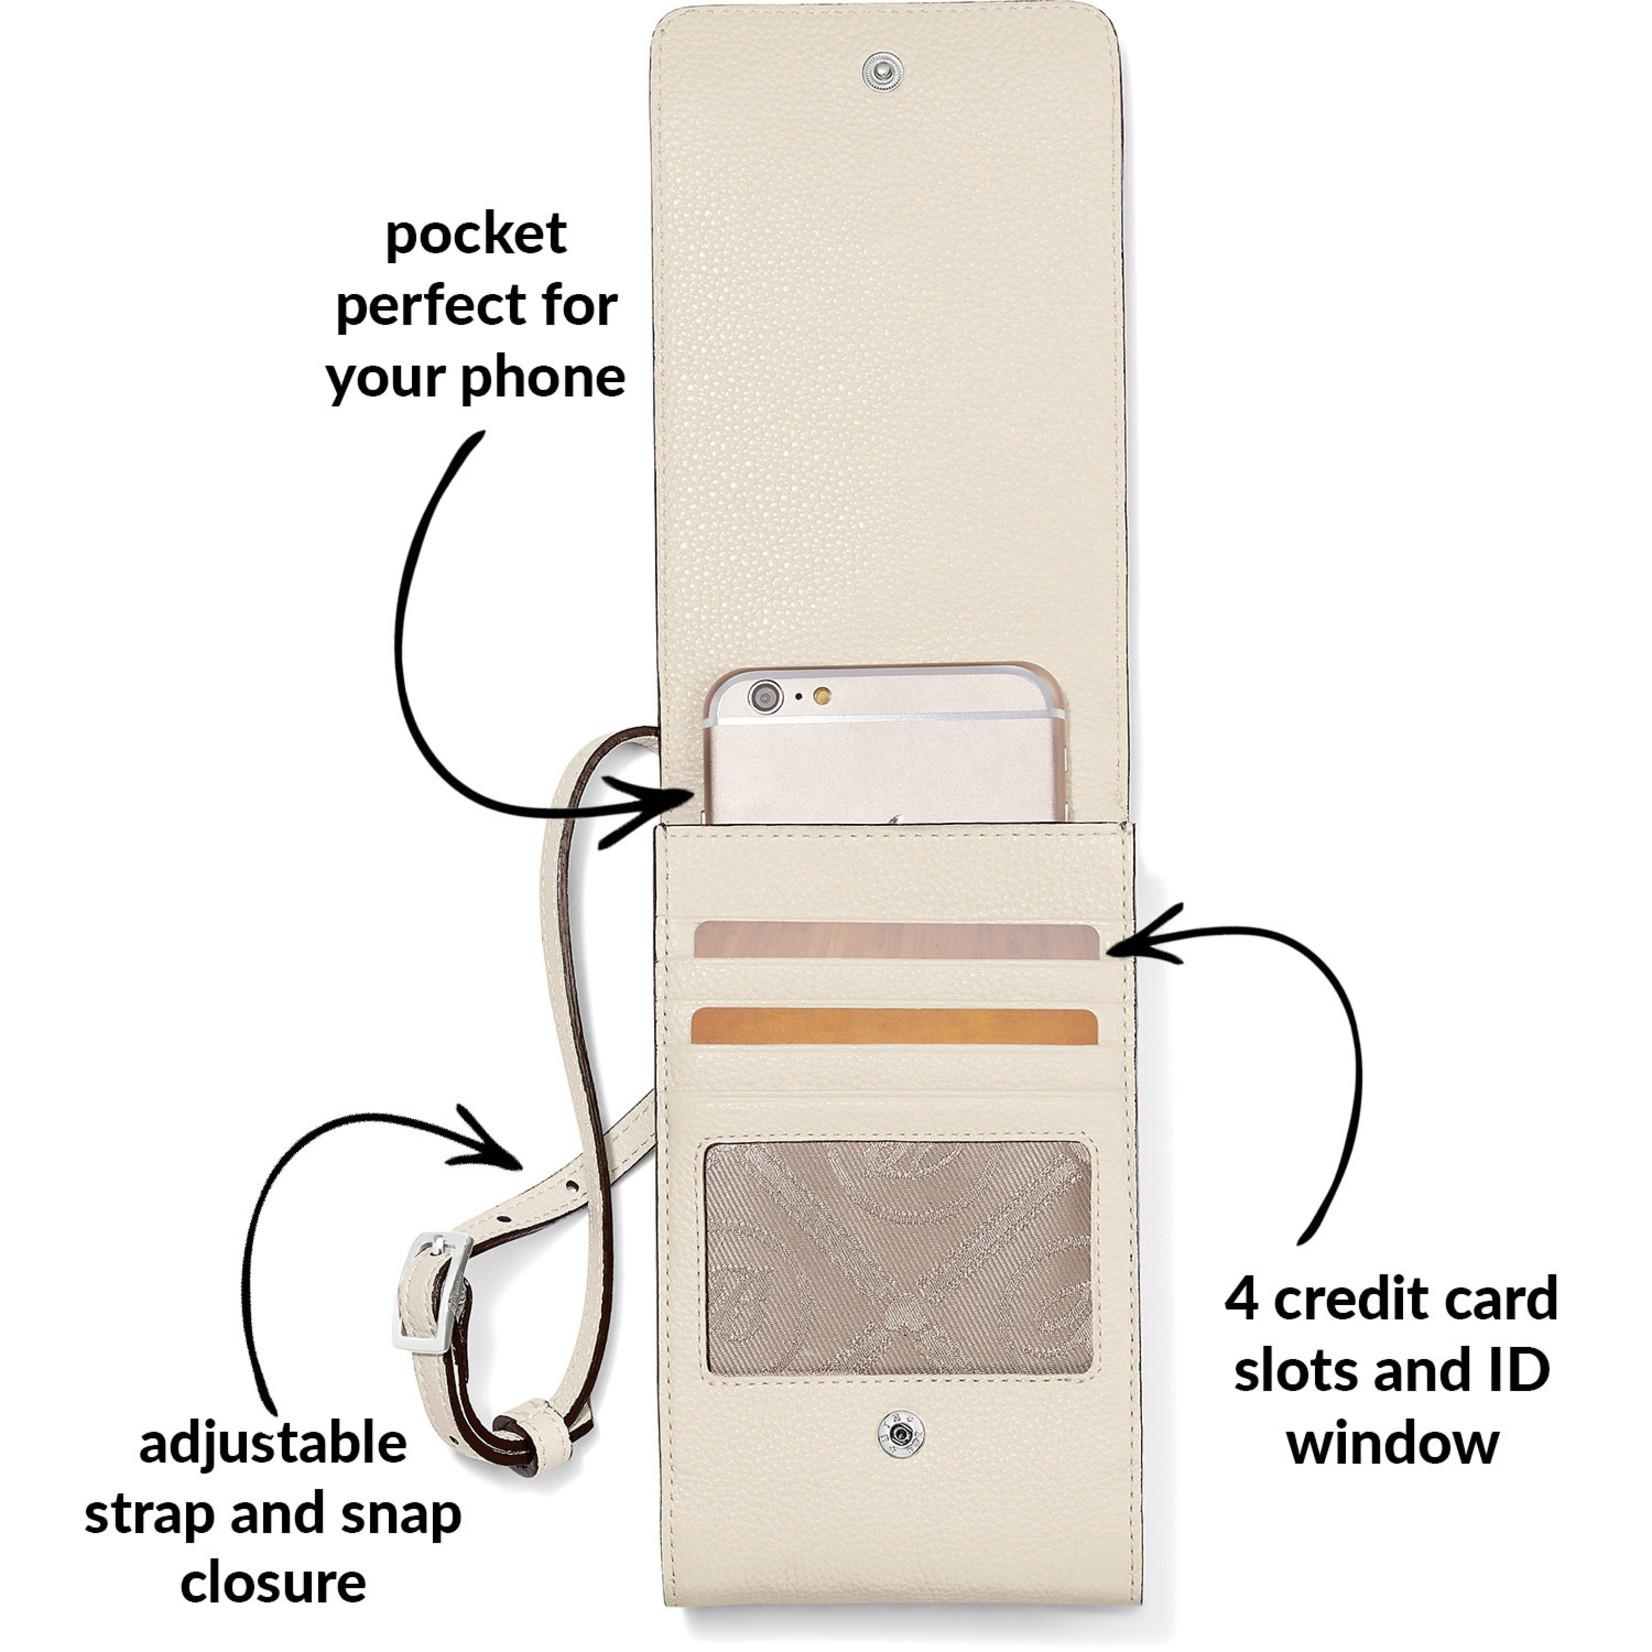 Brighton E53762 Interlok Phone Organizer - White